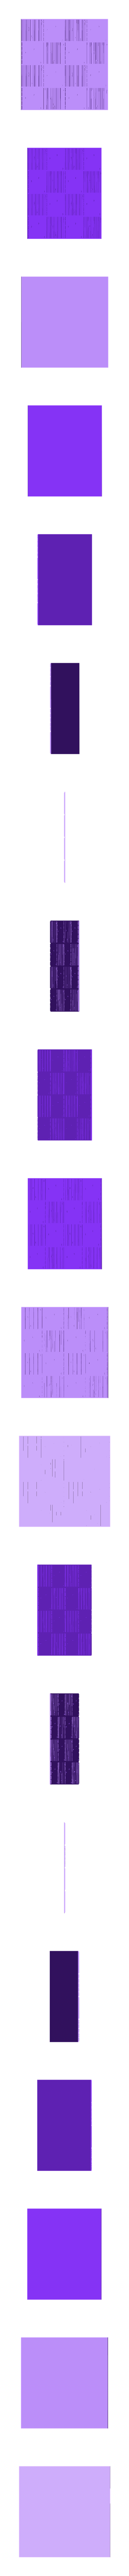 4X4_minimal_wood_floor.stl Download free STL file Minimalist Flooring • 3D printer template, mrhers2